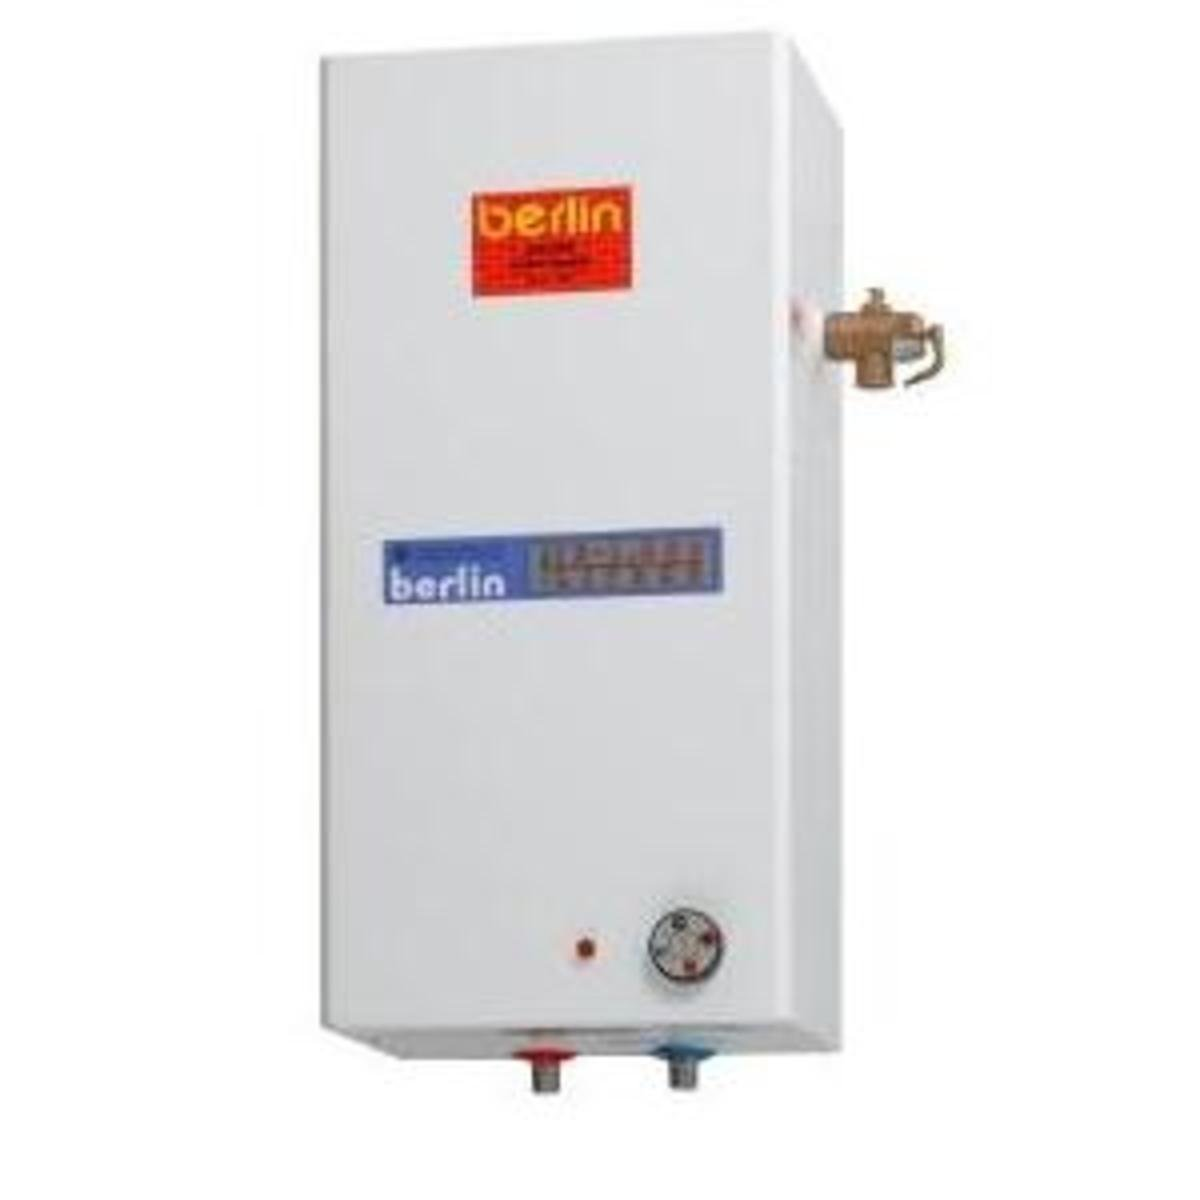 3kw 38公升中央儲水式熱水爐 UHP10 (原價$4800, 特價$3640)